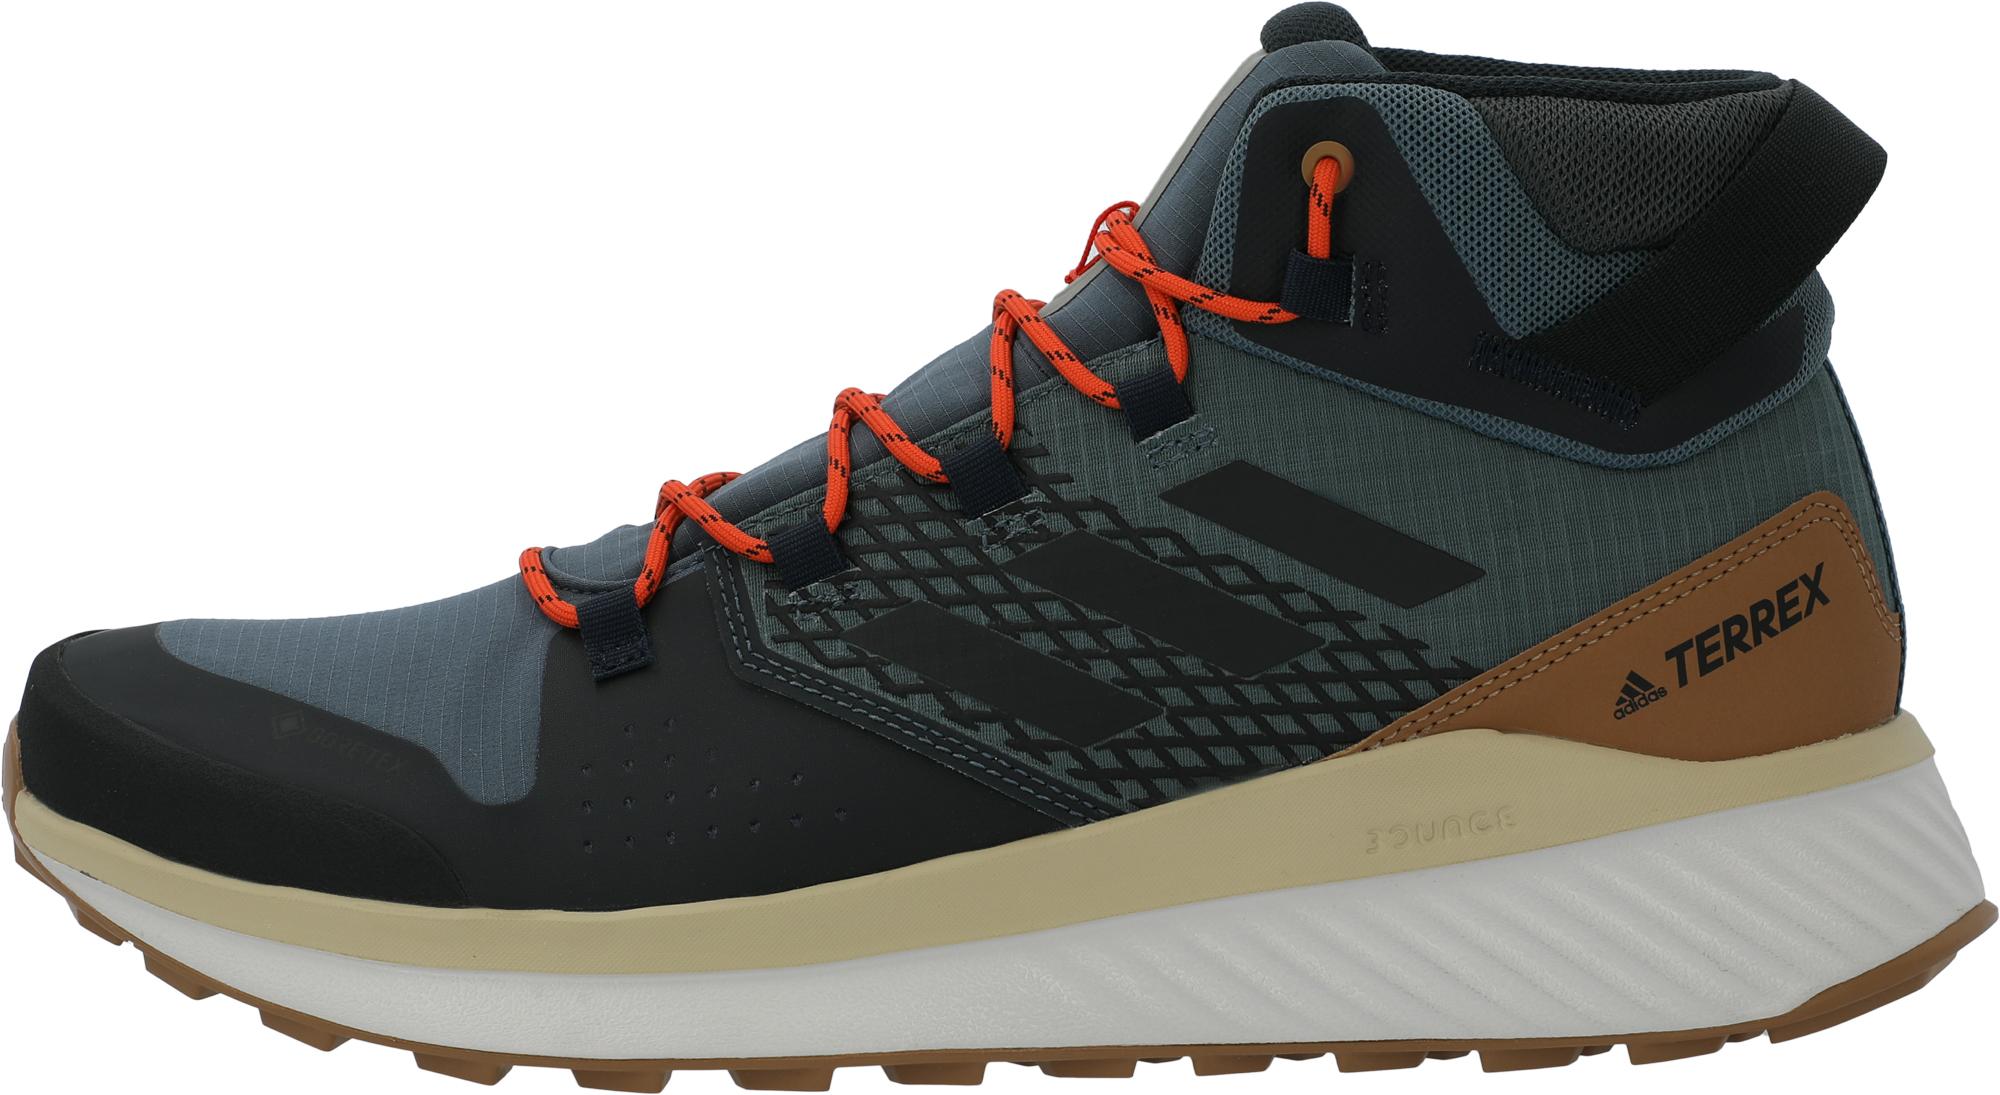 Adidas Ботинки мужские Adidas Terrex Folgian Hiker Mid Gtx, размер 41